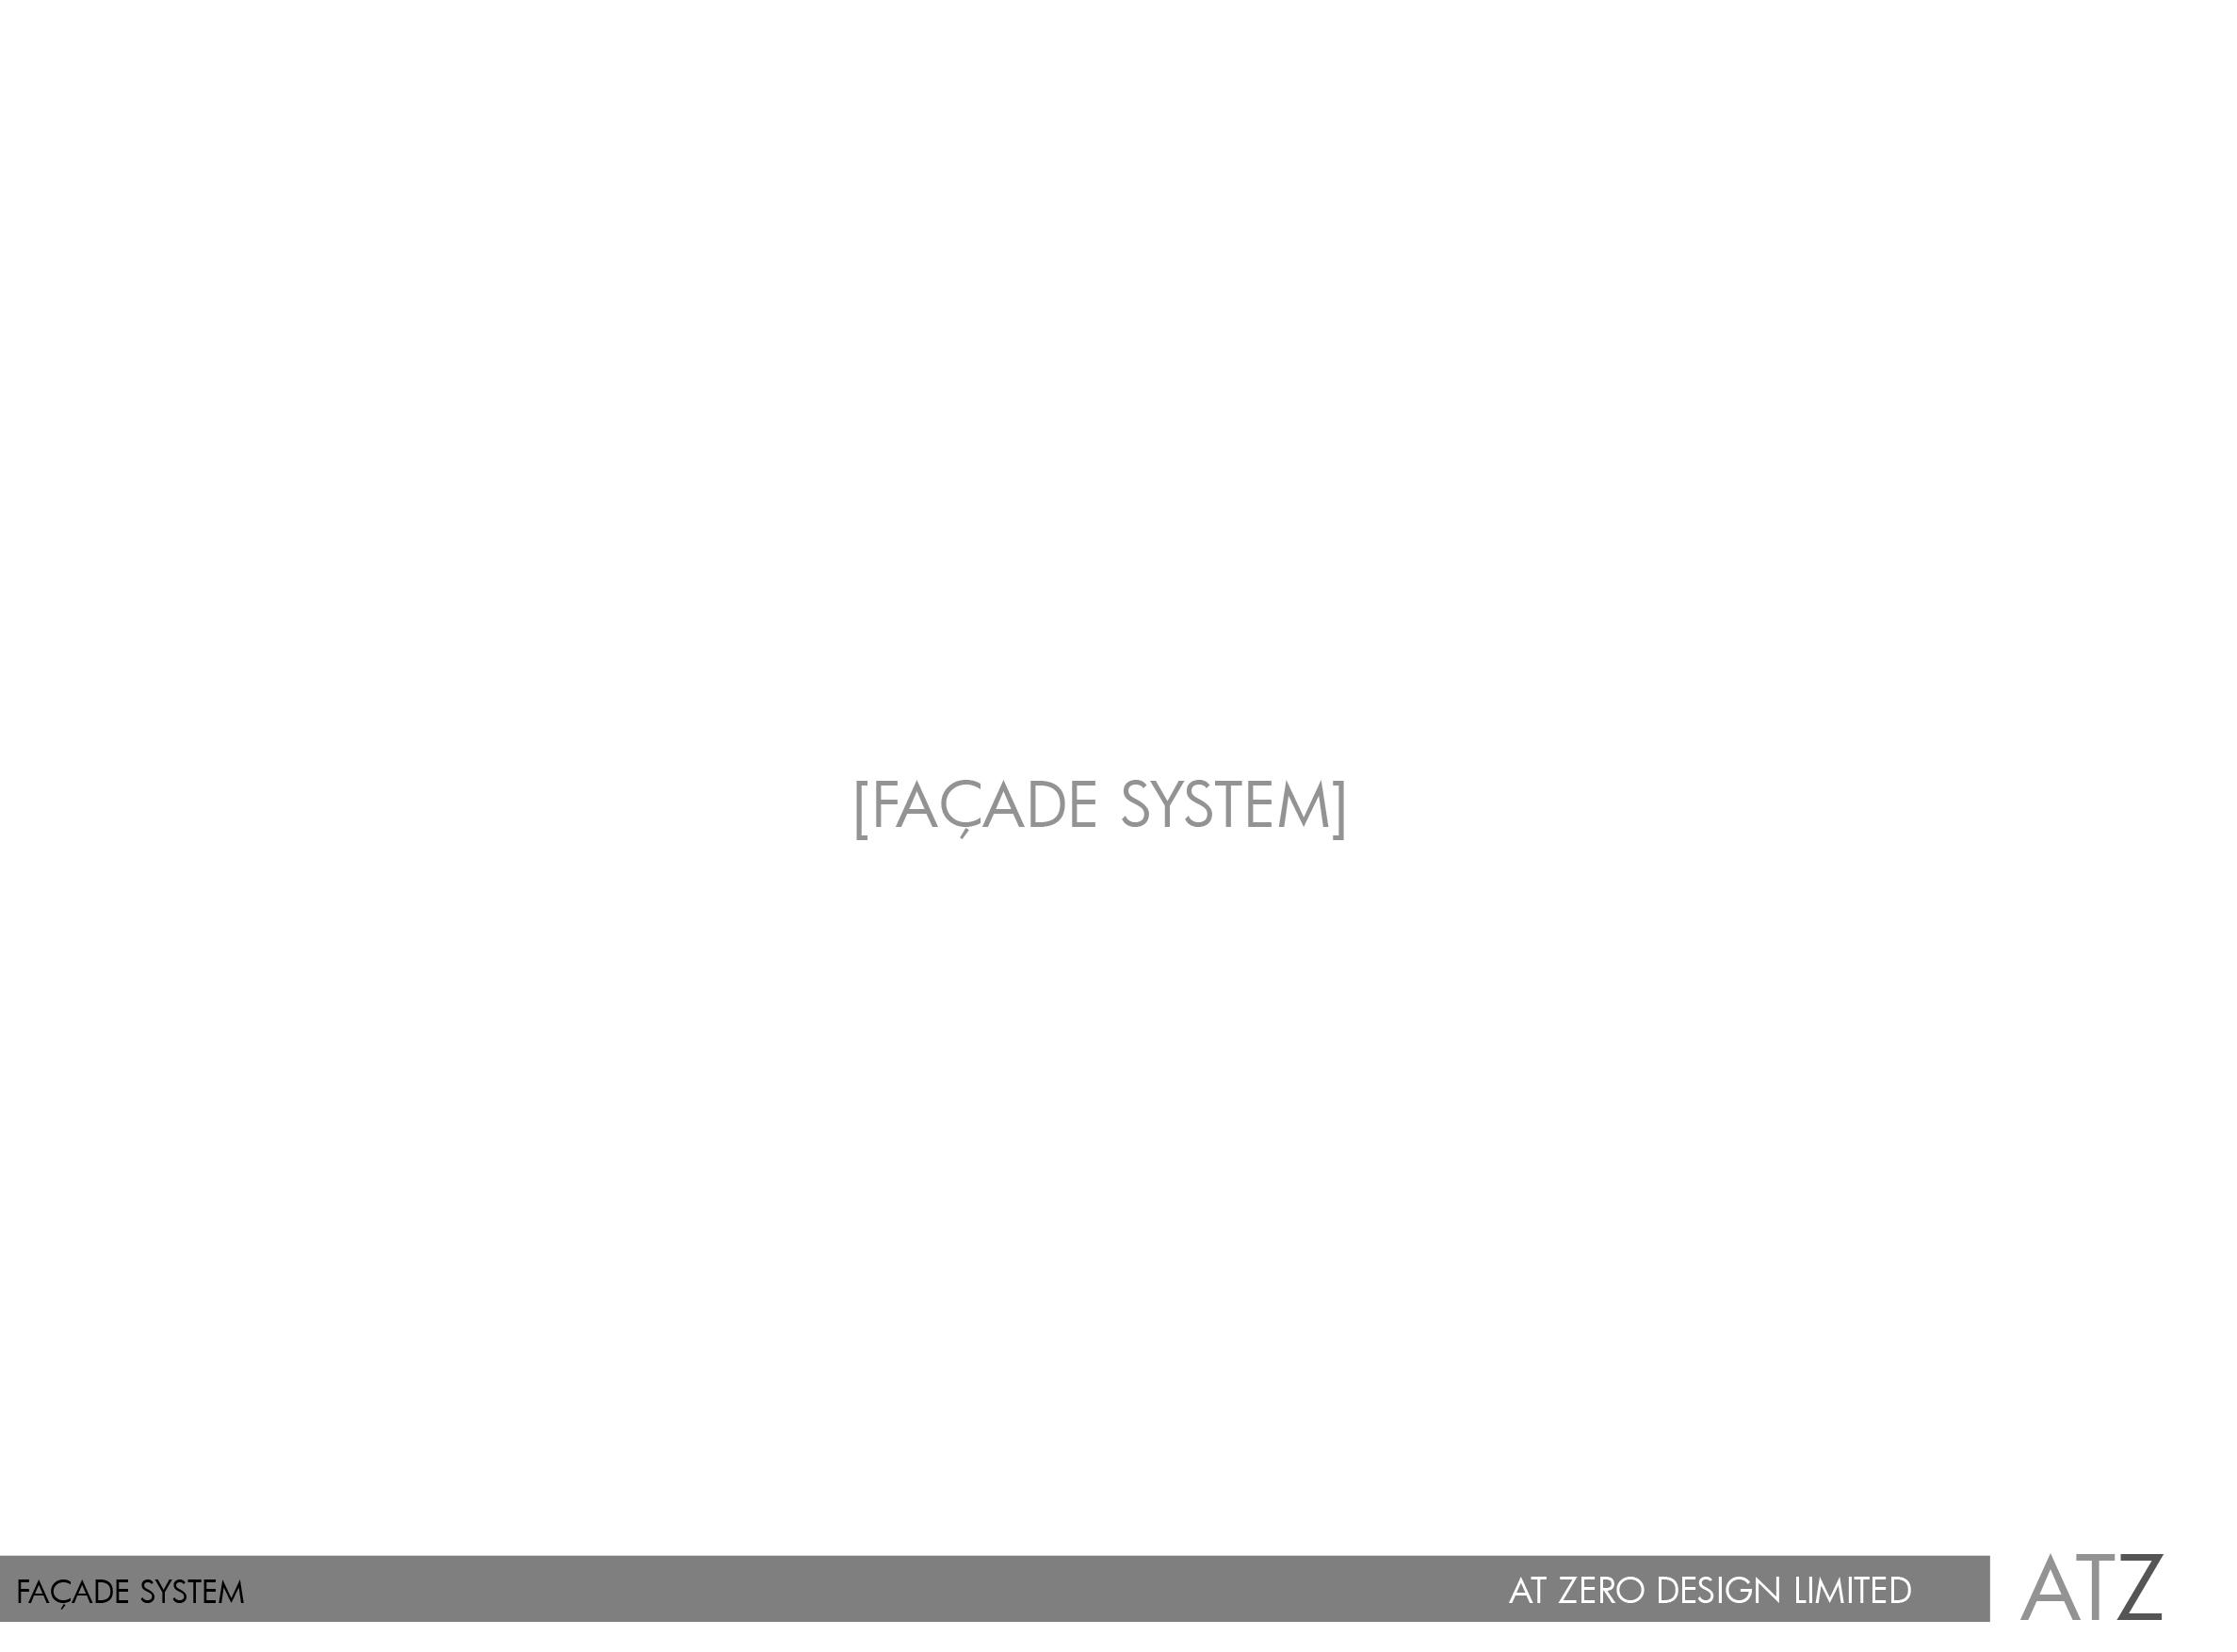 20161017_GUCCI-FACADE-PRESENTATION-06.jpg